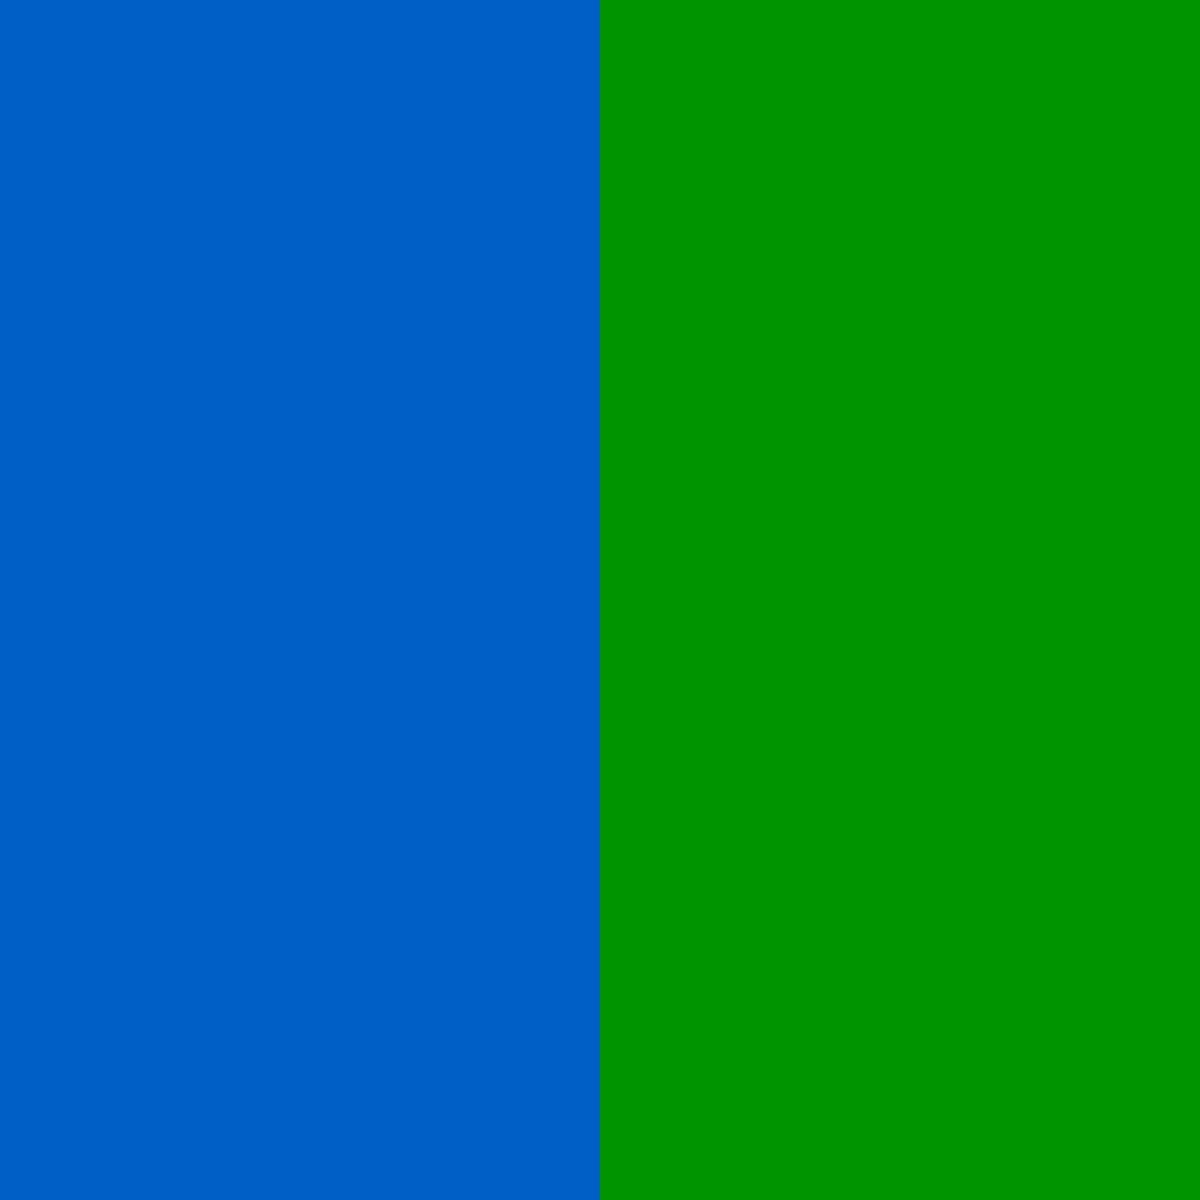 Modrá/Zelená (Blue/Green)